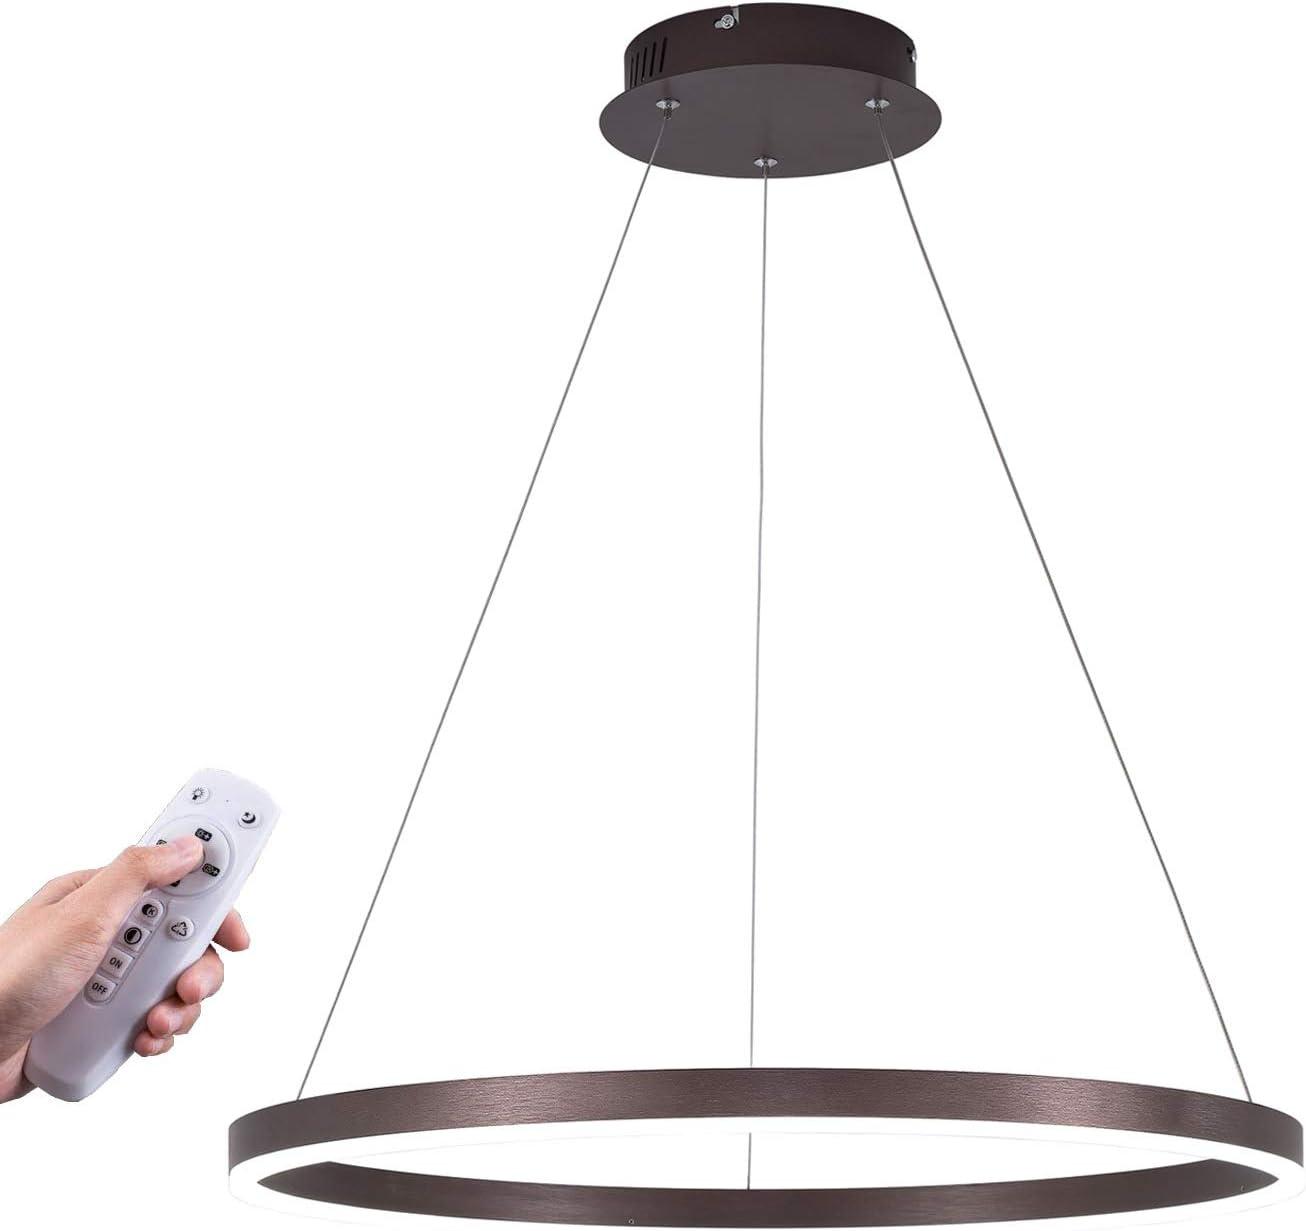 1 Licht Dimmable geführt Pendant Light, Kitchen Island Lighting Fixtures Dining Zimmer Chandeliers, Foyer Ceiling Hanging Light, Chrome Suspension 36W 5000K(Super Bright Natural White, mit Dimmer)